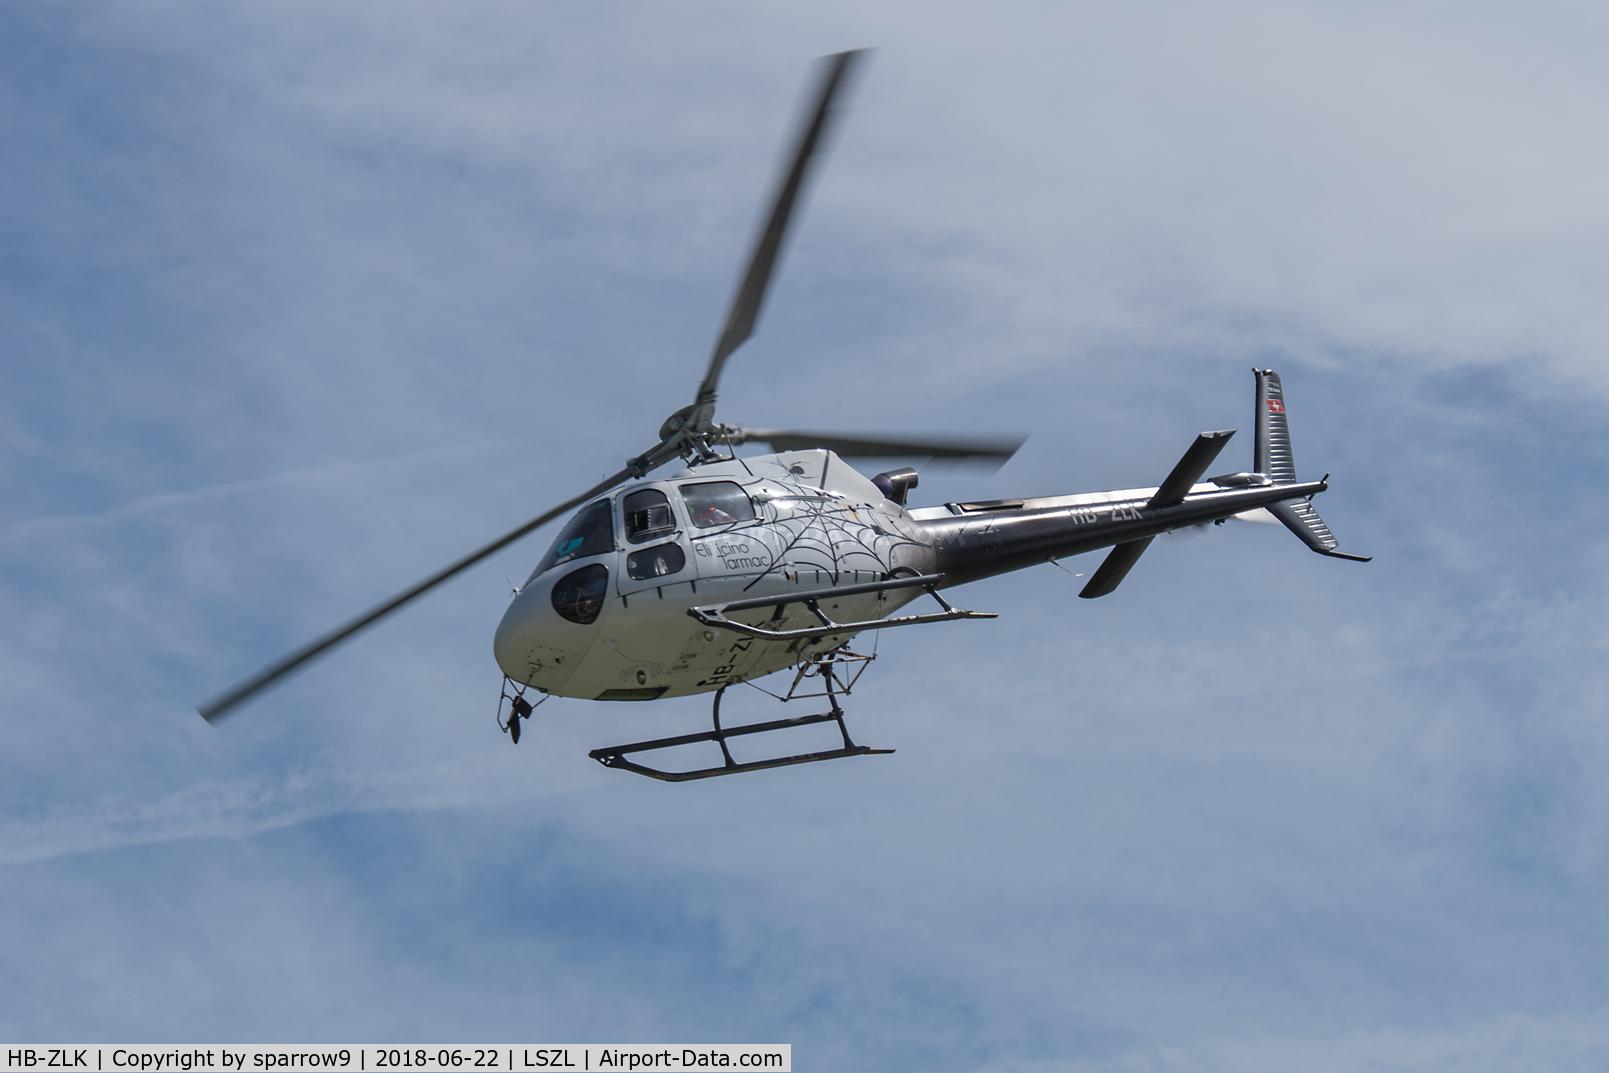 HB-ZLK, 2011 Eurocopter AS-350B-3 Ecureuil C/N 7115, At Locarno-Magadino